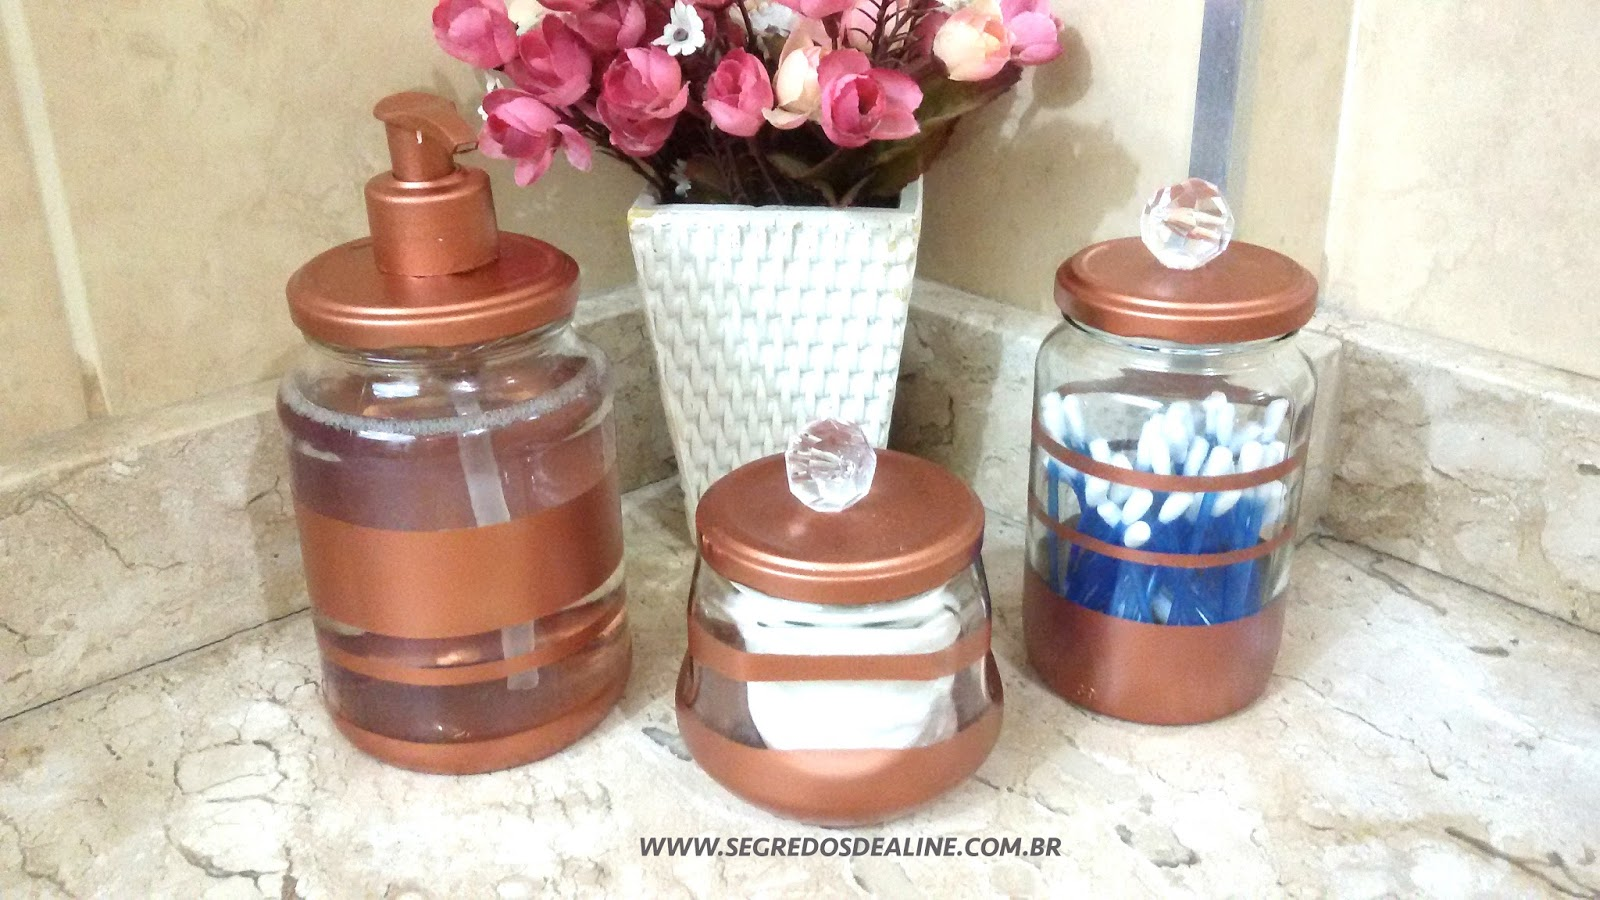 Adesivo Para Desentupir Vaso Sanitário Onde Comprar ~ Segredos de Aline Pote de Vidro Decorado